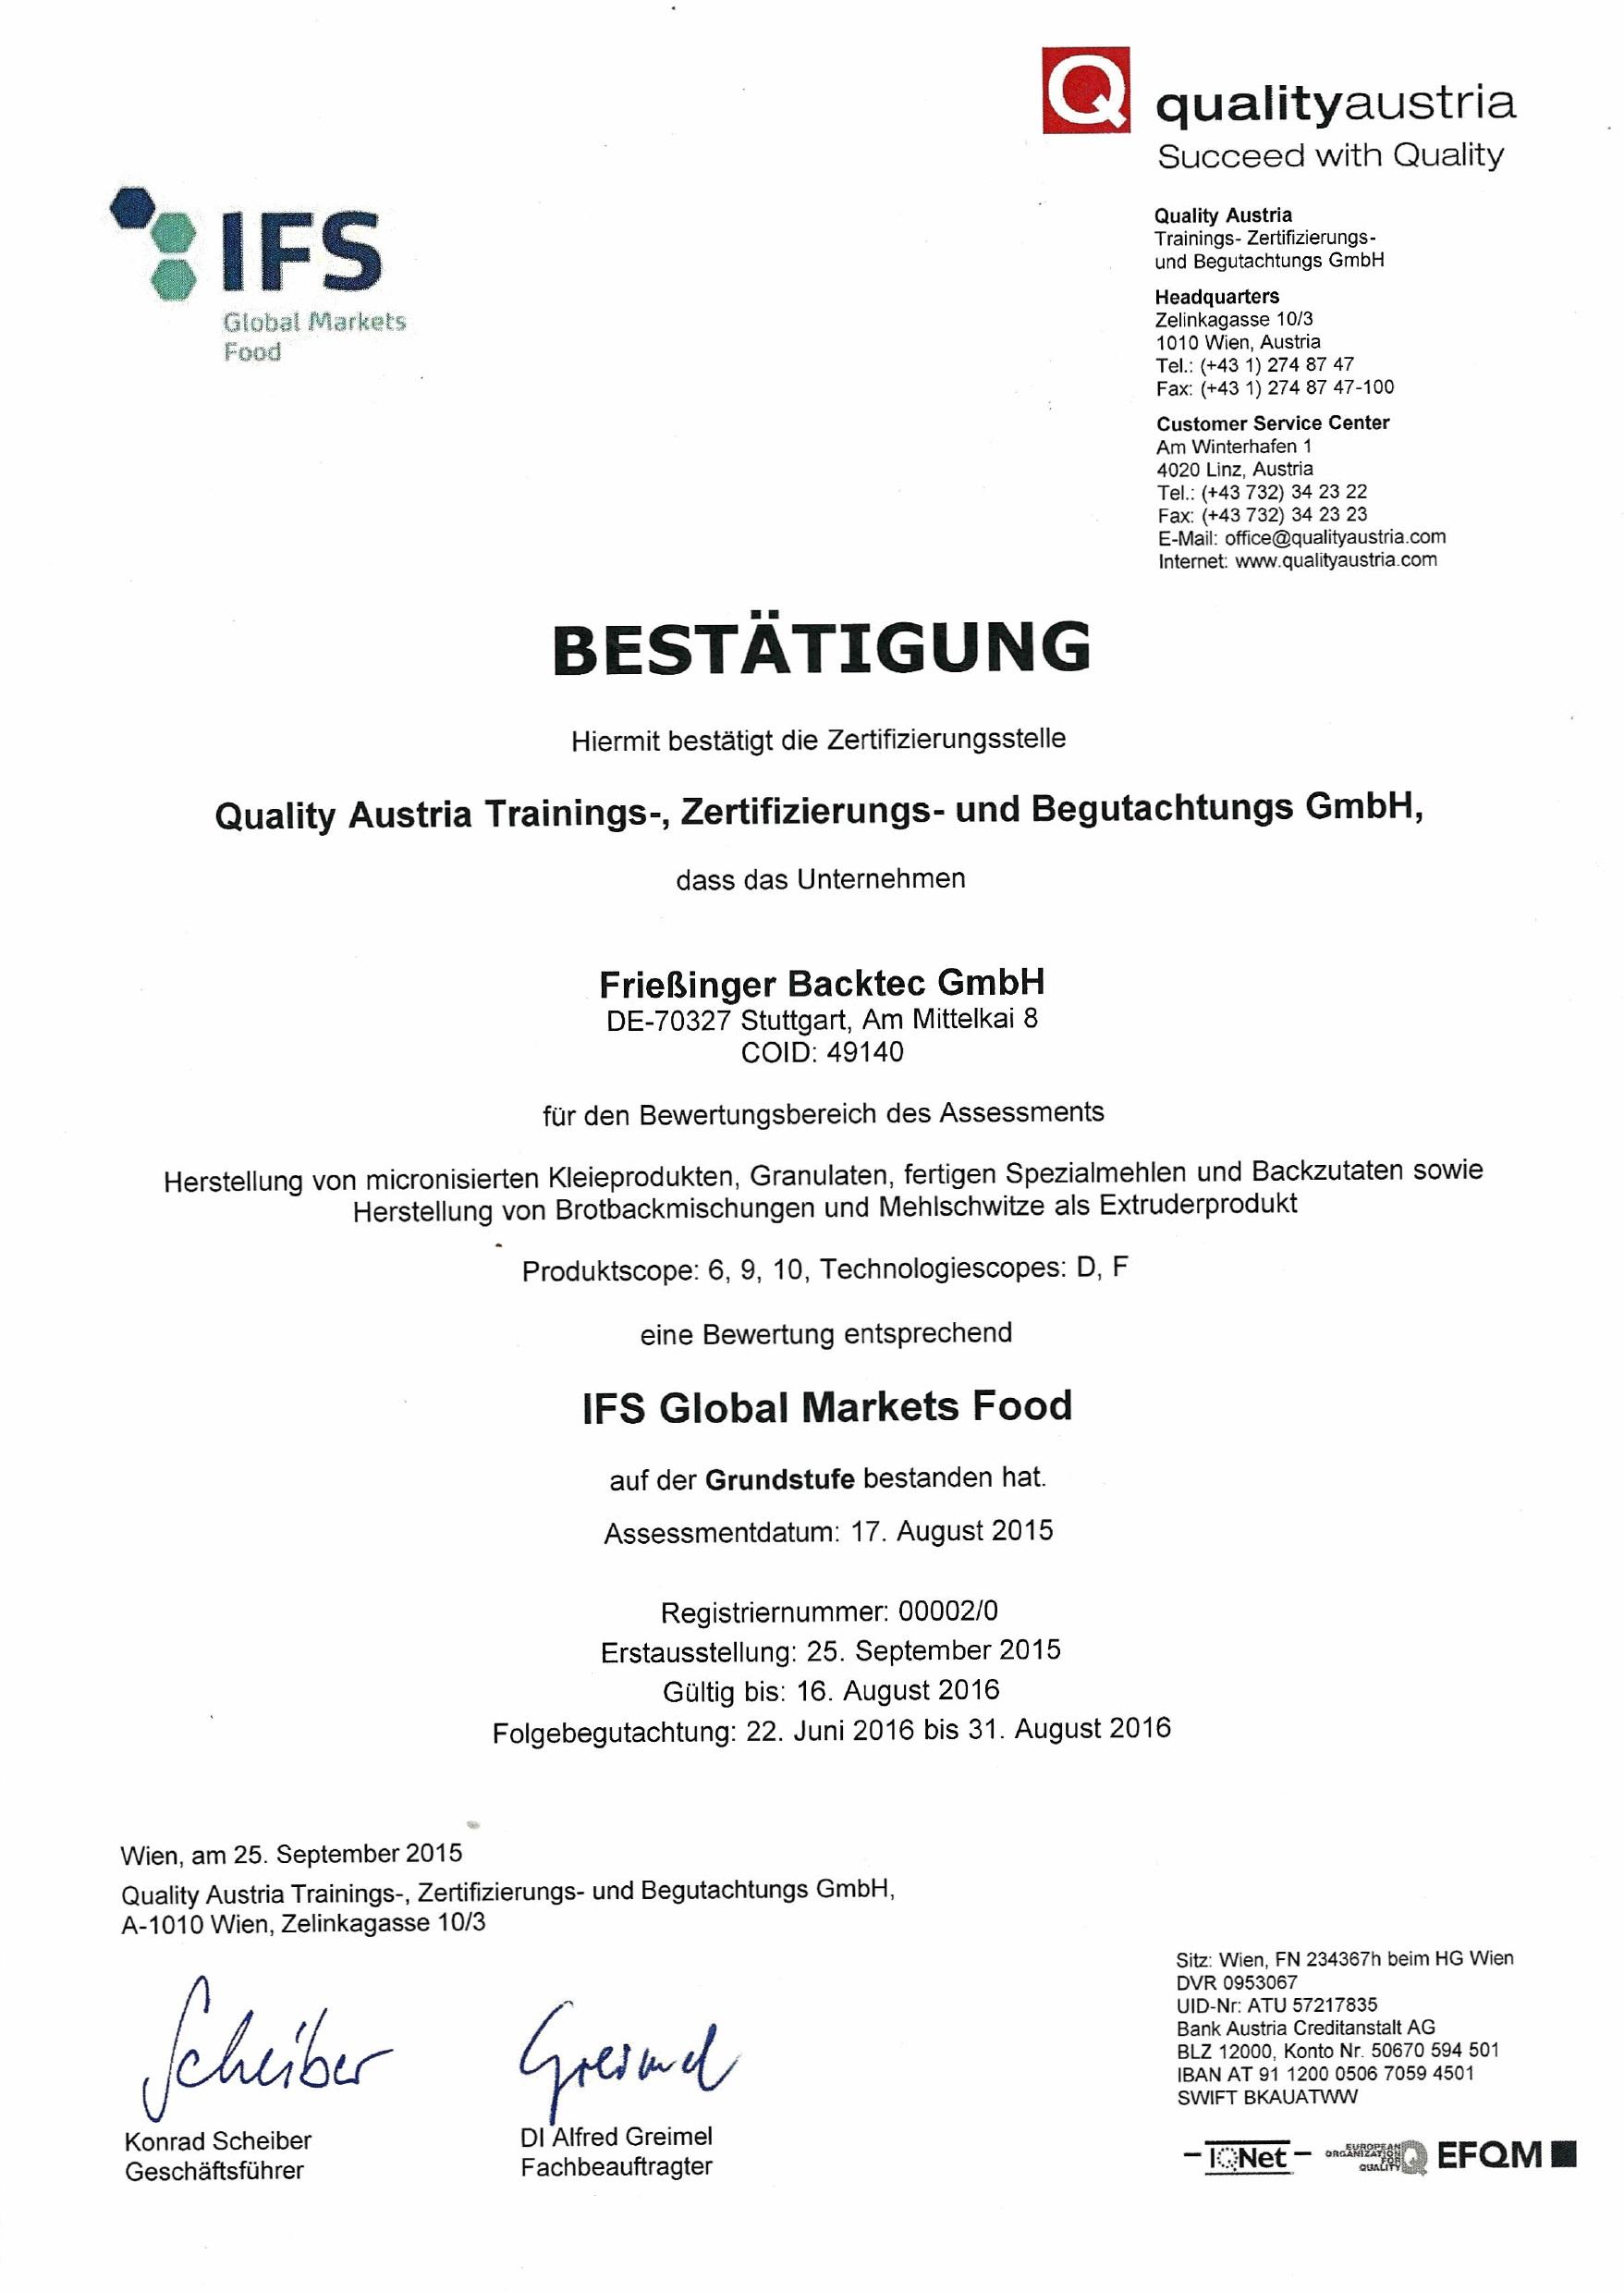 Unser IFS-Zertifikat